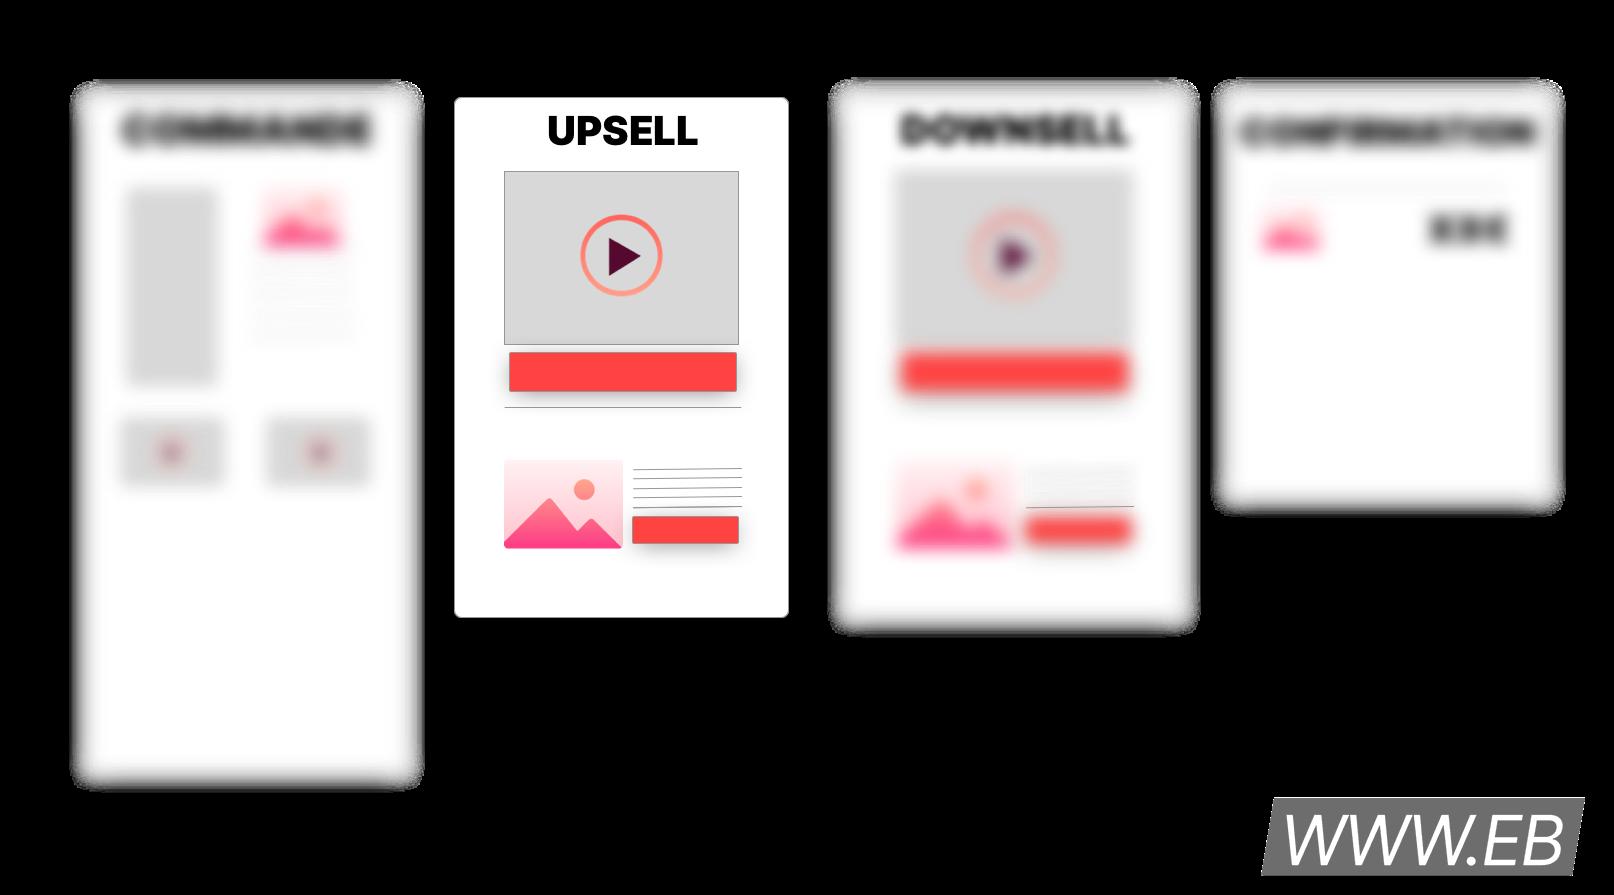 Schéma de tunnel de vente mettant en avant la page d'upsell